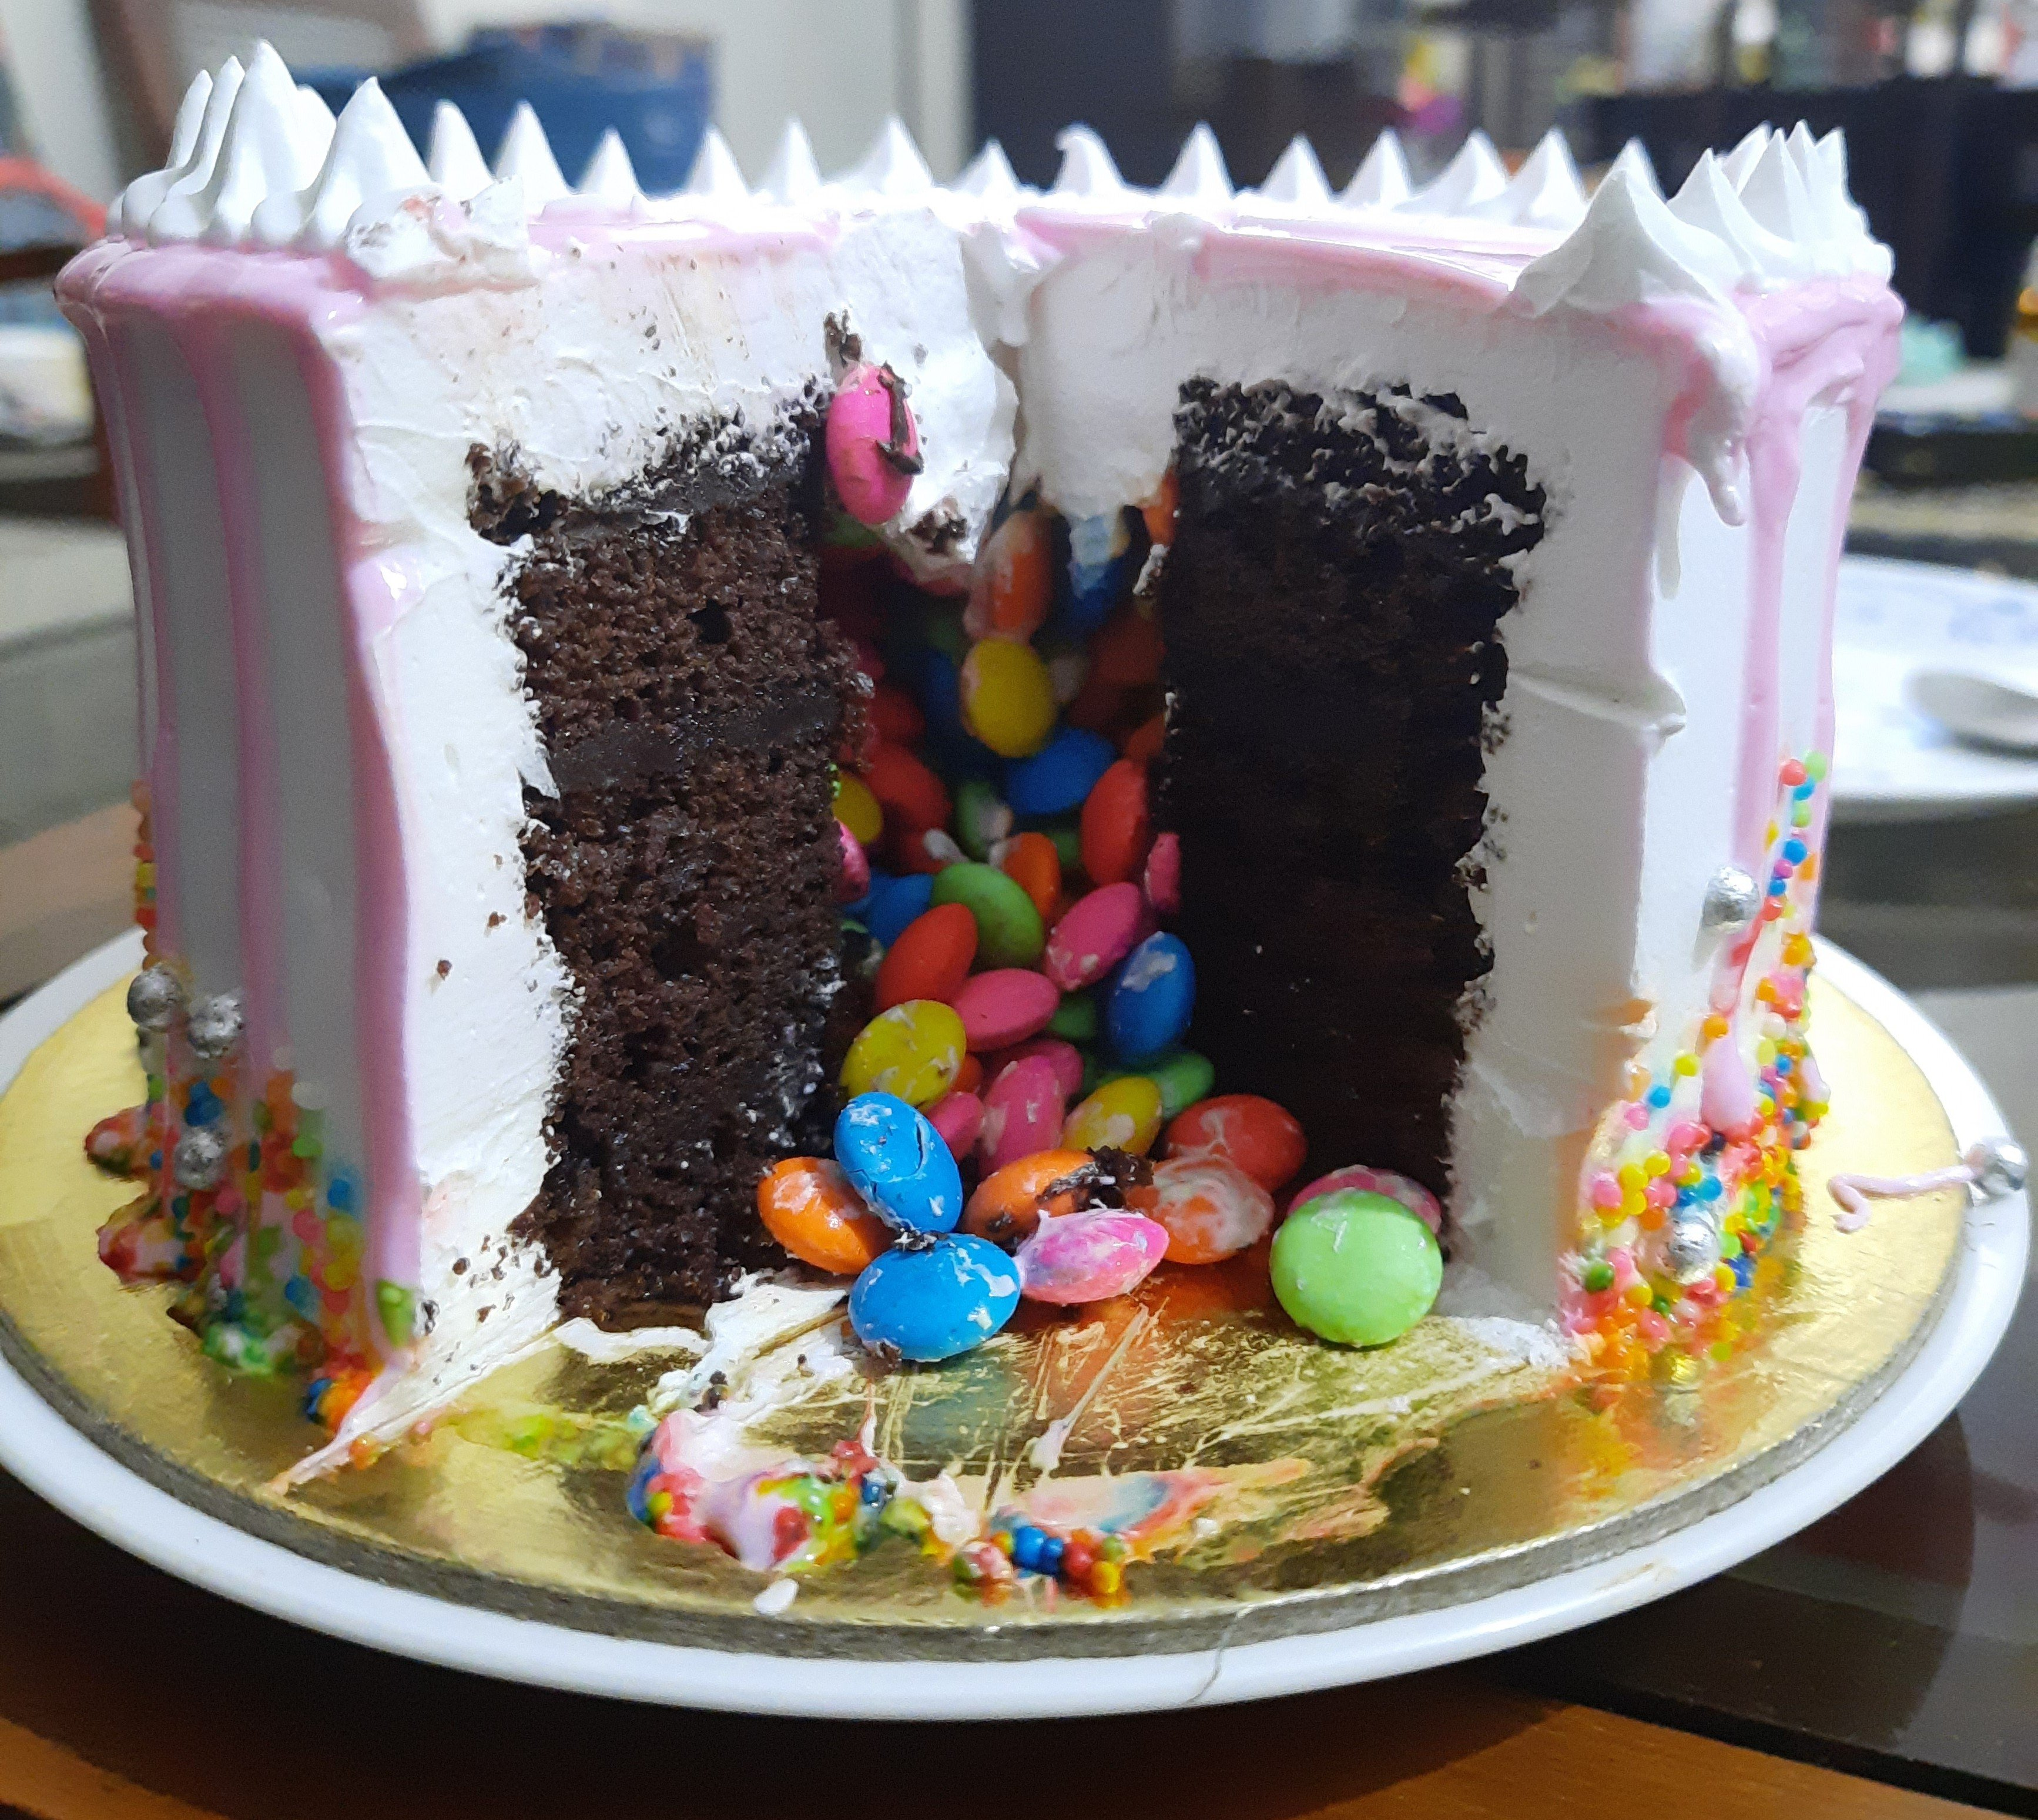 Chocolate Cake With Gems Inside 1 kg